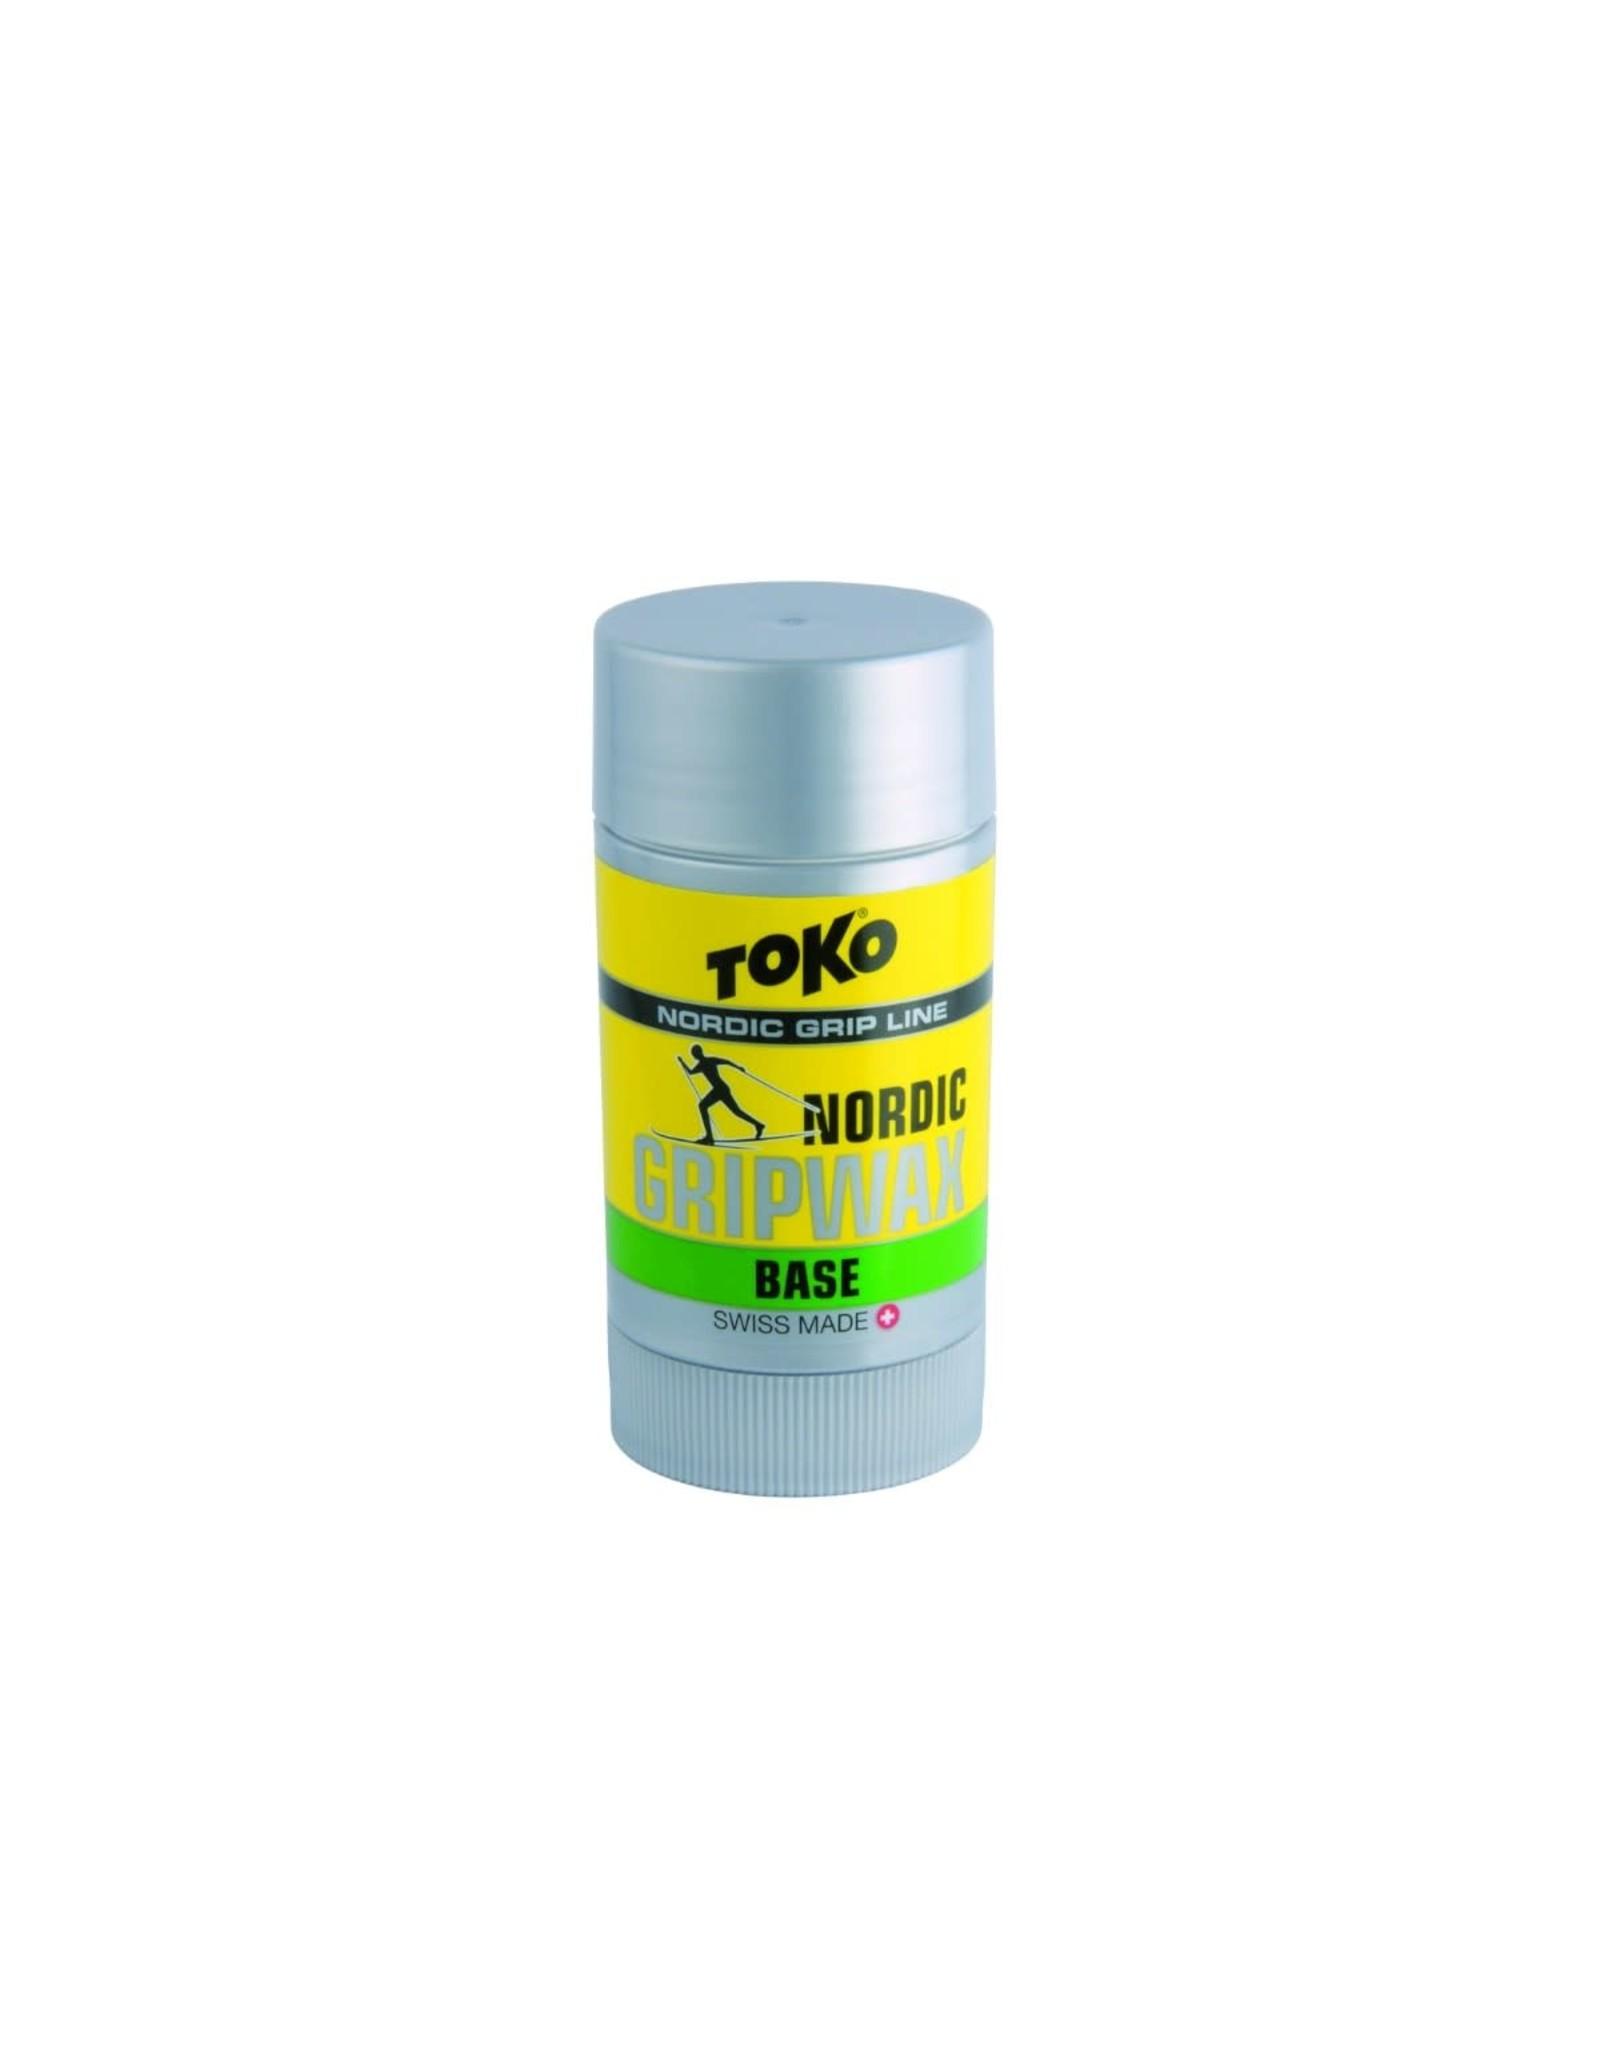 Toko Toko Nordic Grip Wax Base Green